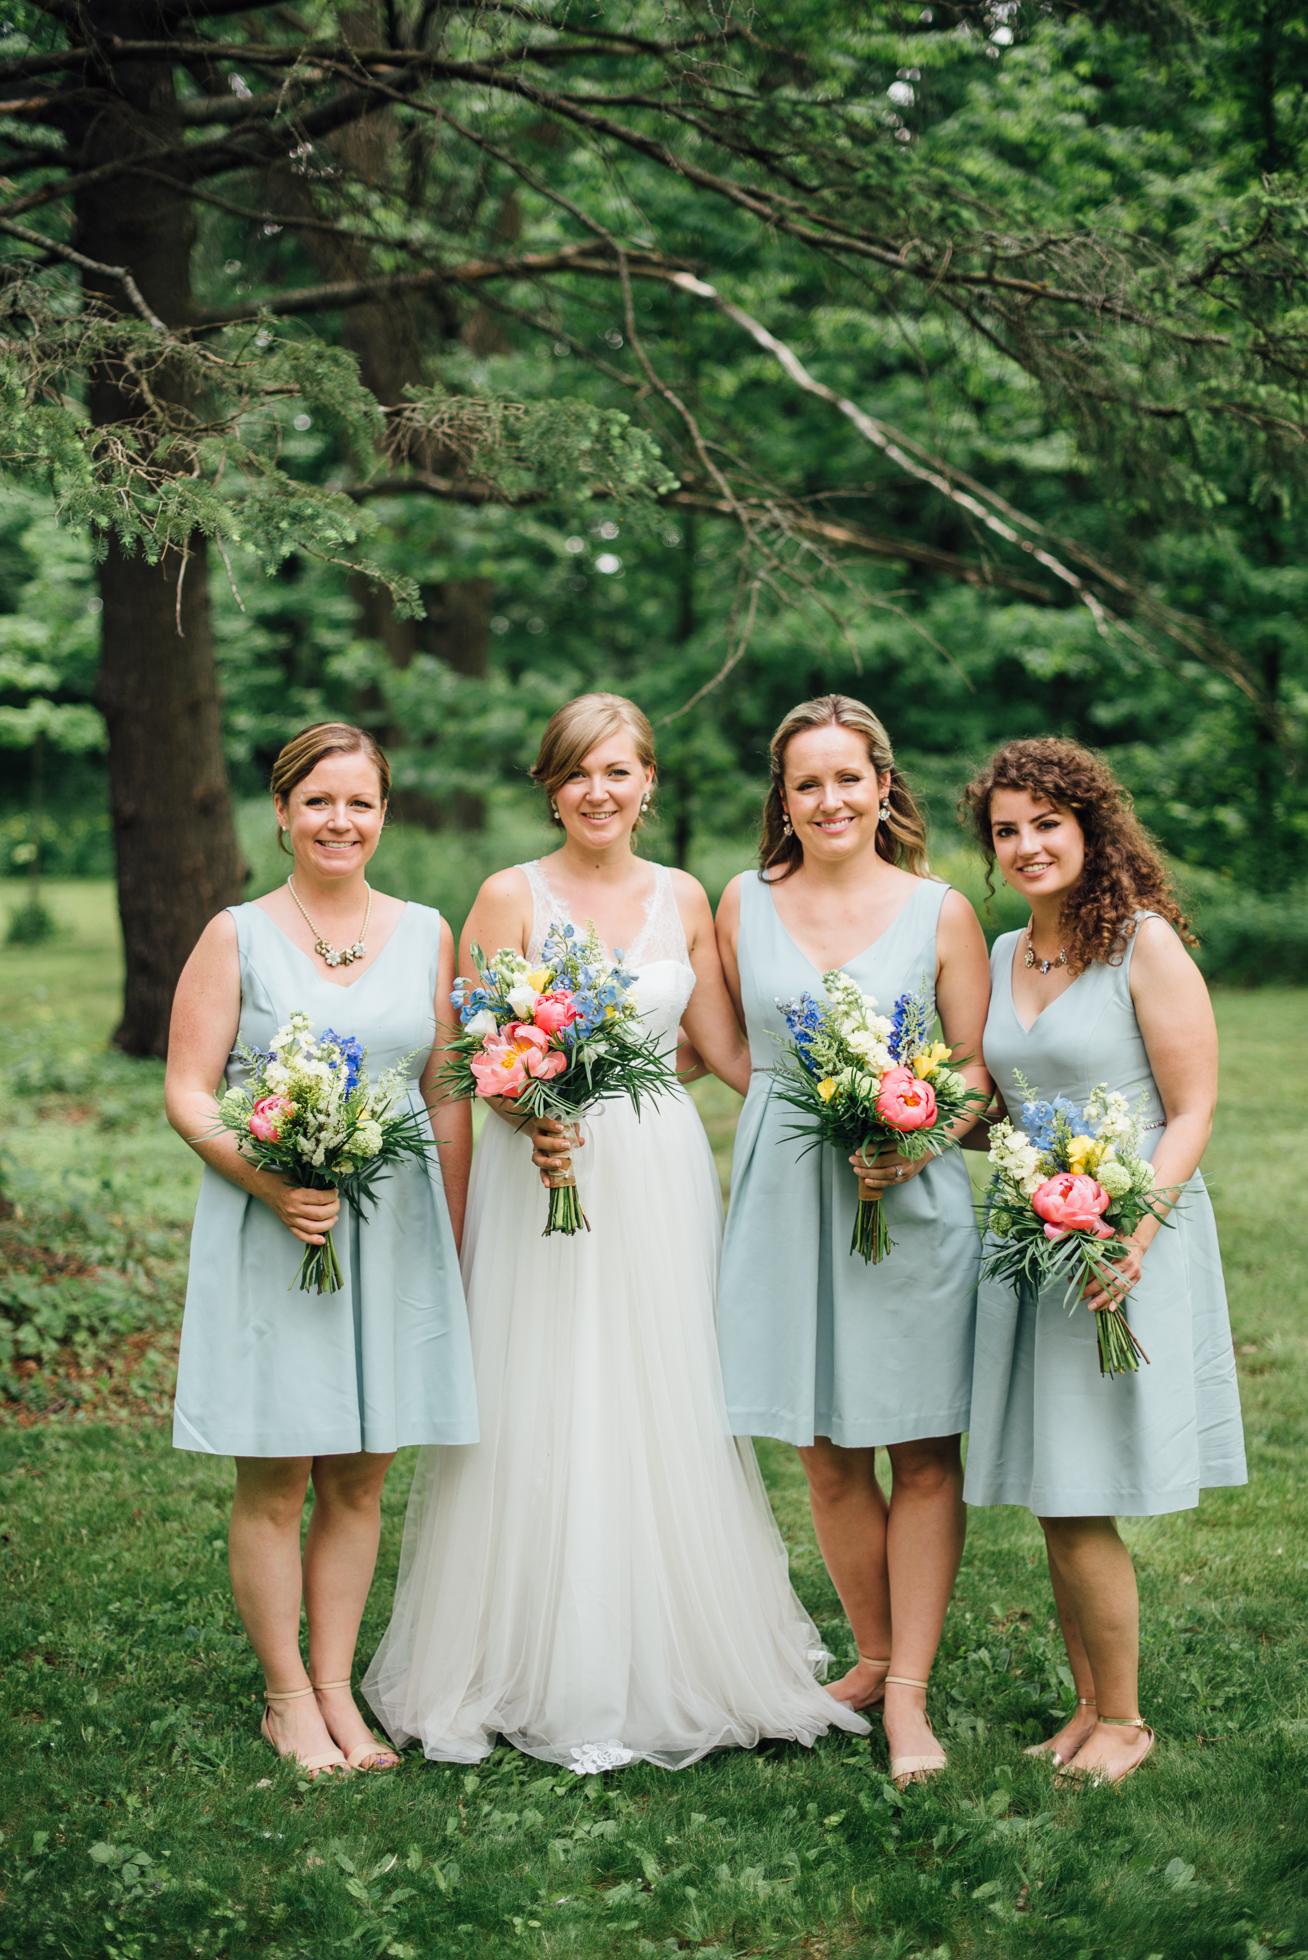 Outdoor-Caledon-Tralee-Wedding-Photography-39